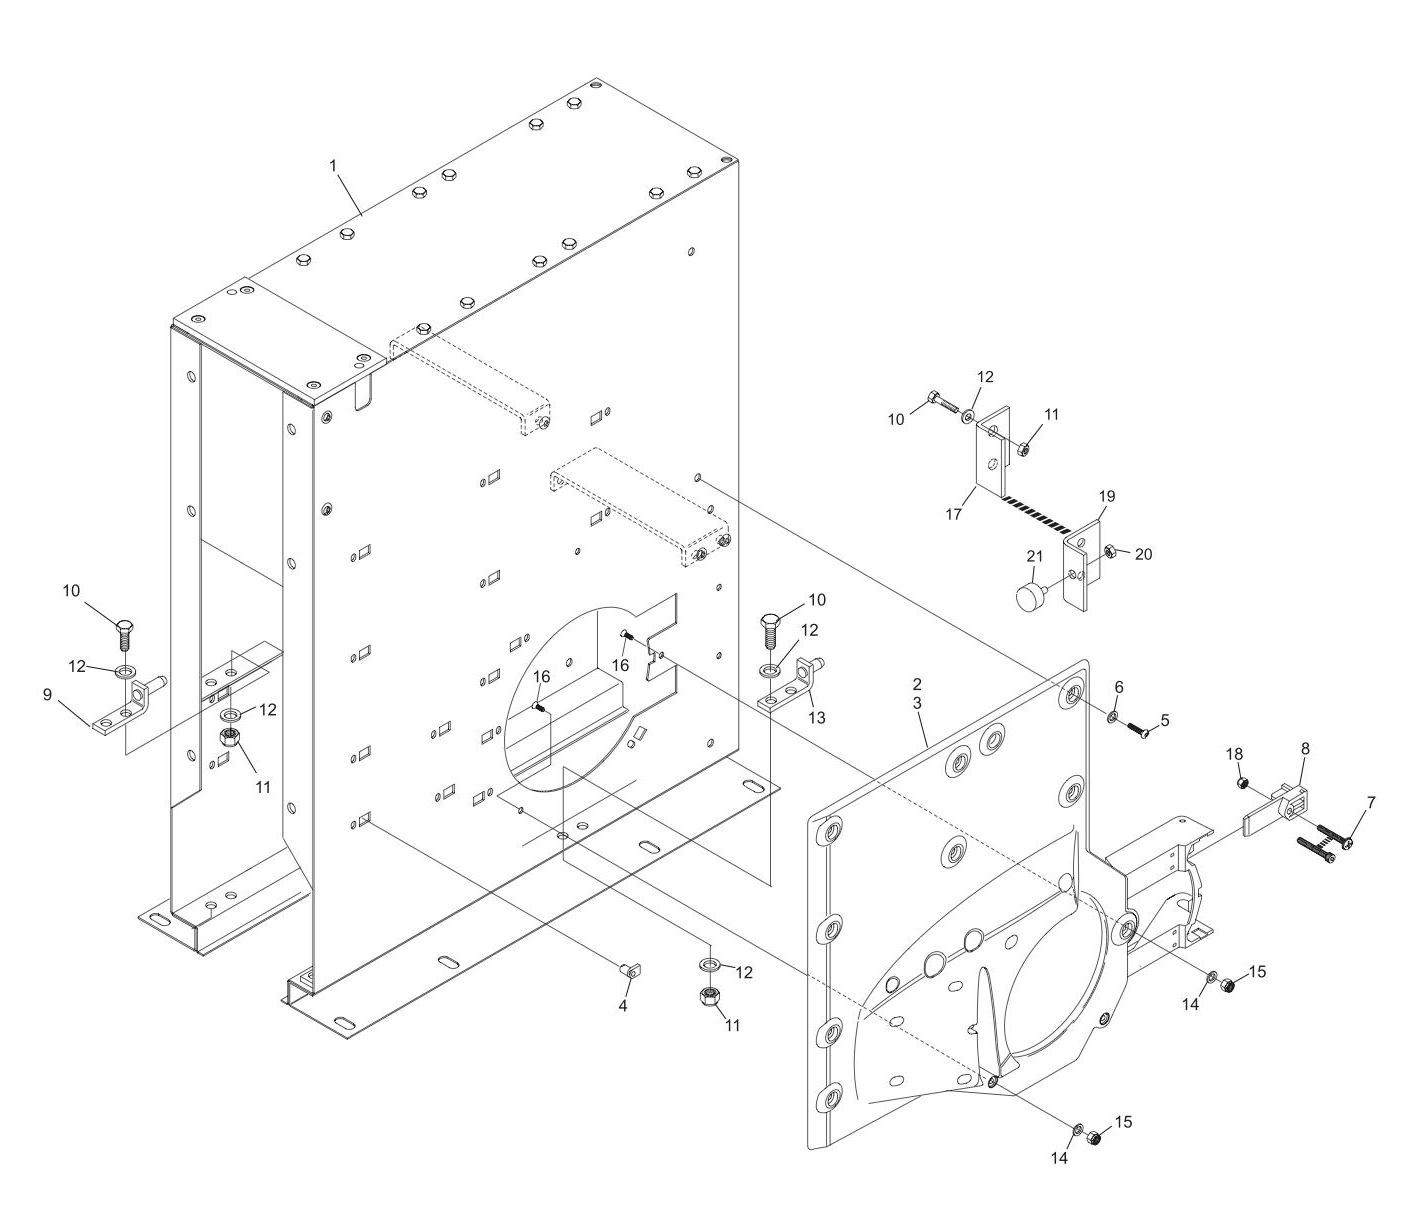 GS-X/CPO Accelerator Box Assembly